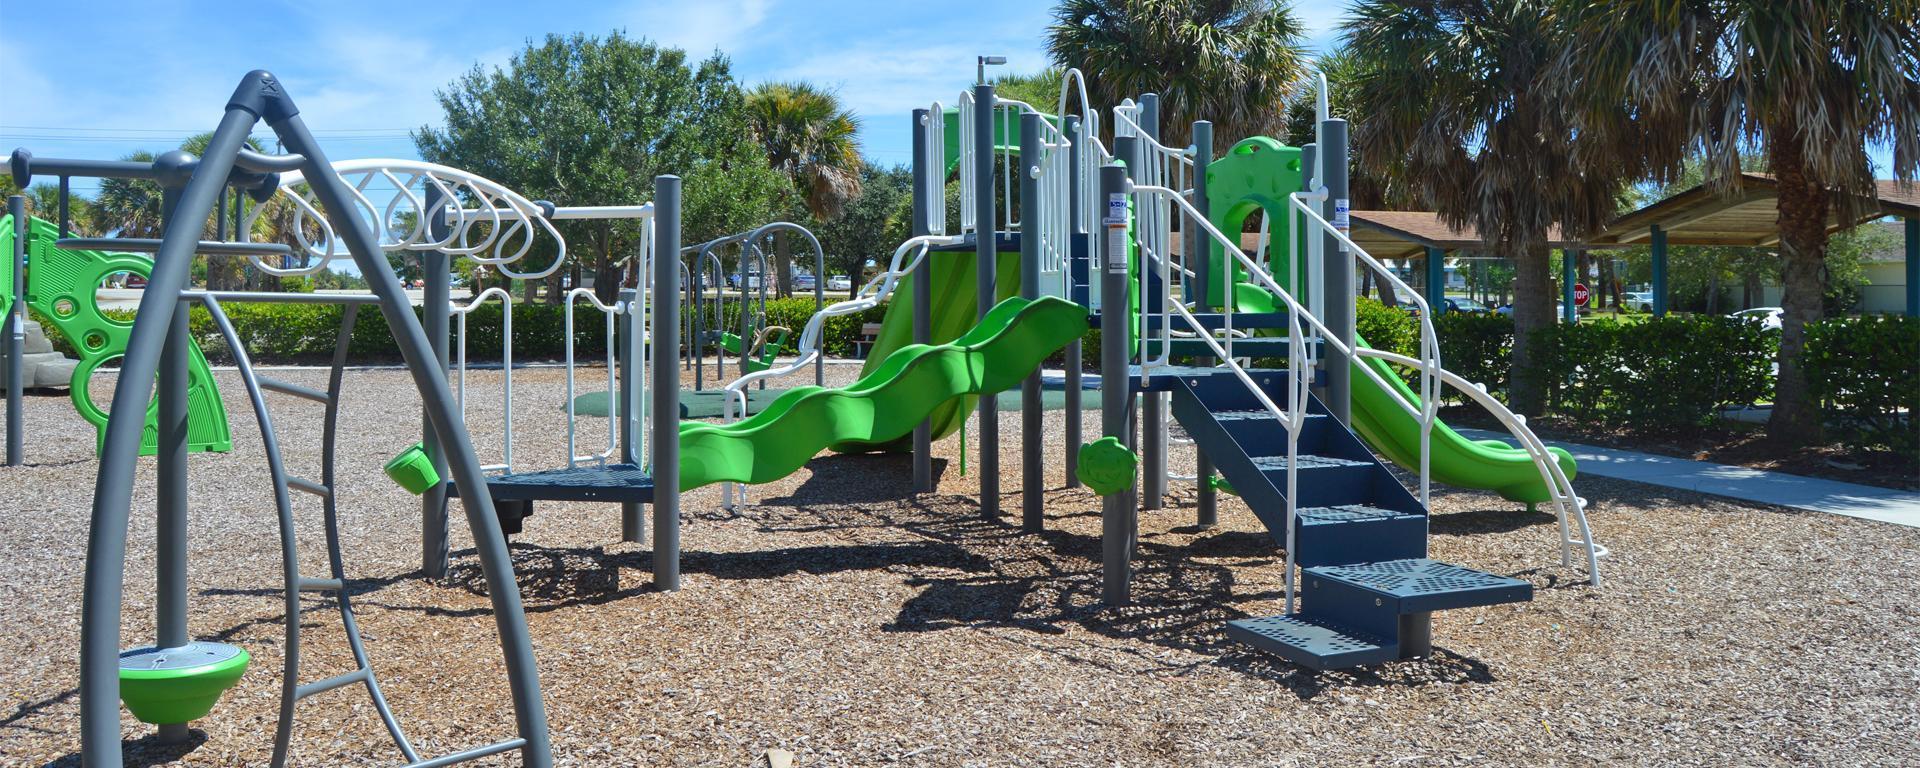 The children's playground at Langford Park